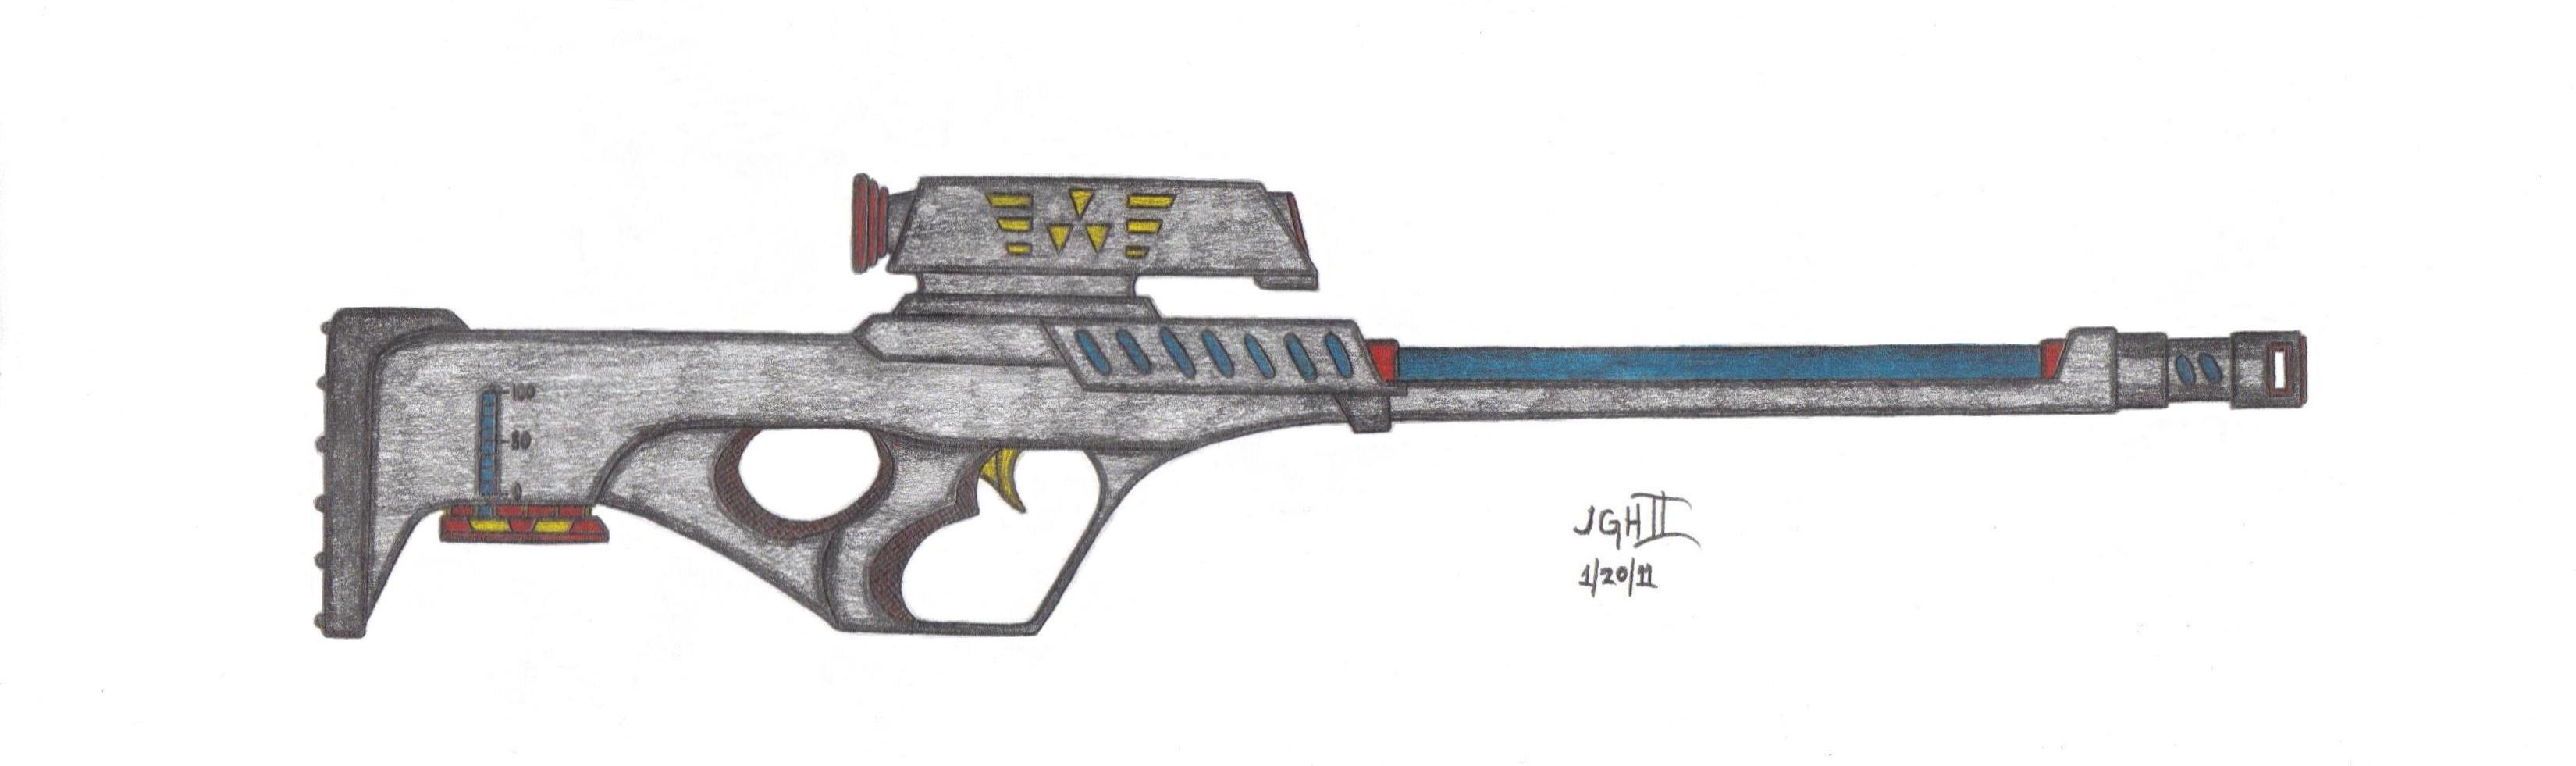 Drawn pistol sniper gun CzechBiohazard steyraug Plasma Explore DeviantArt